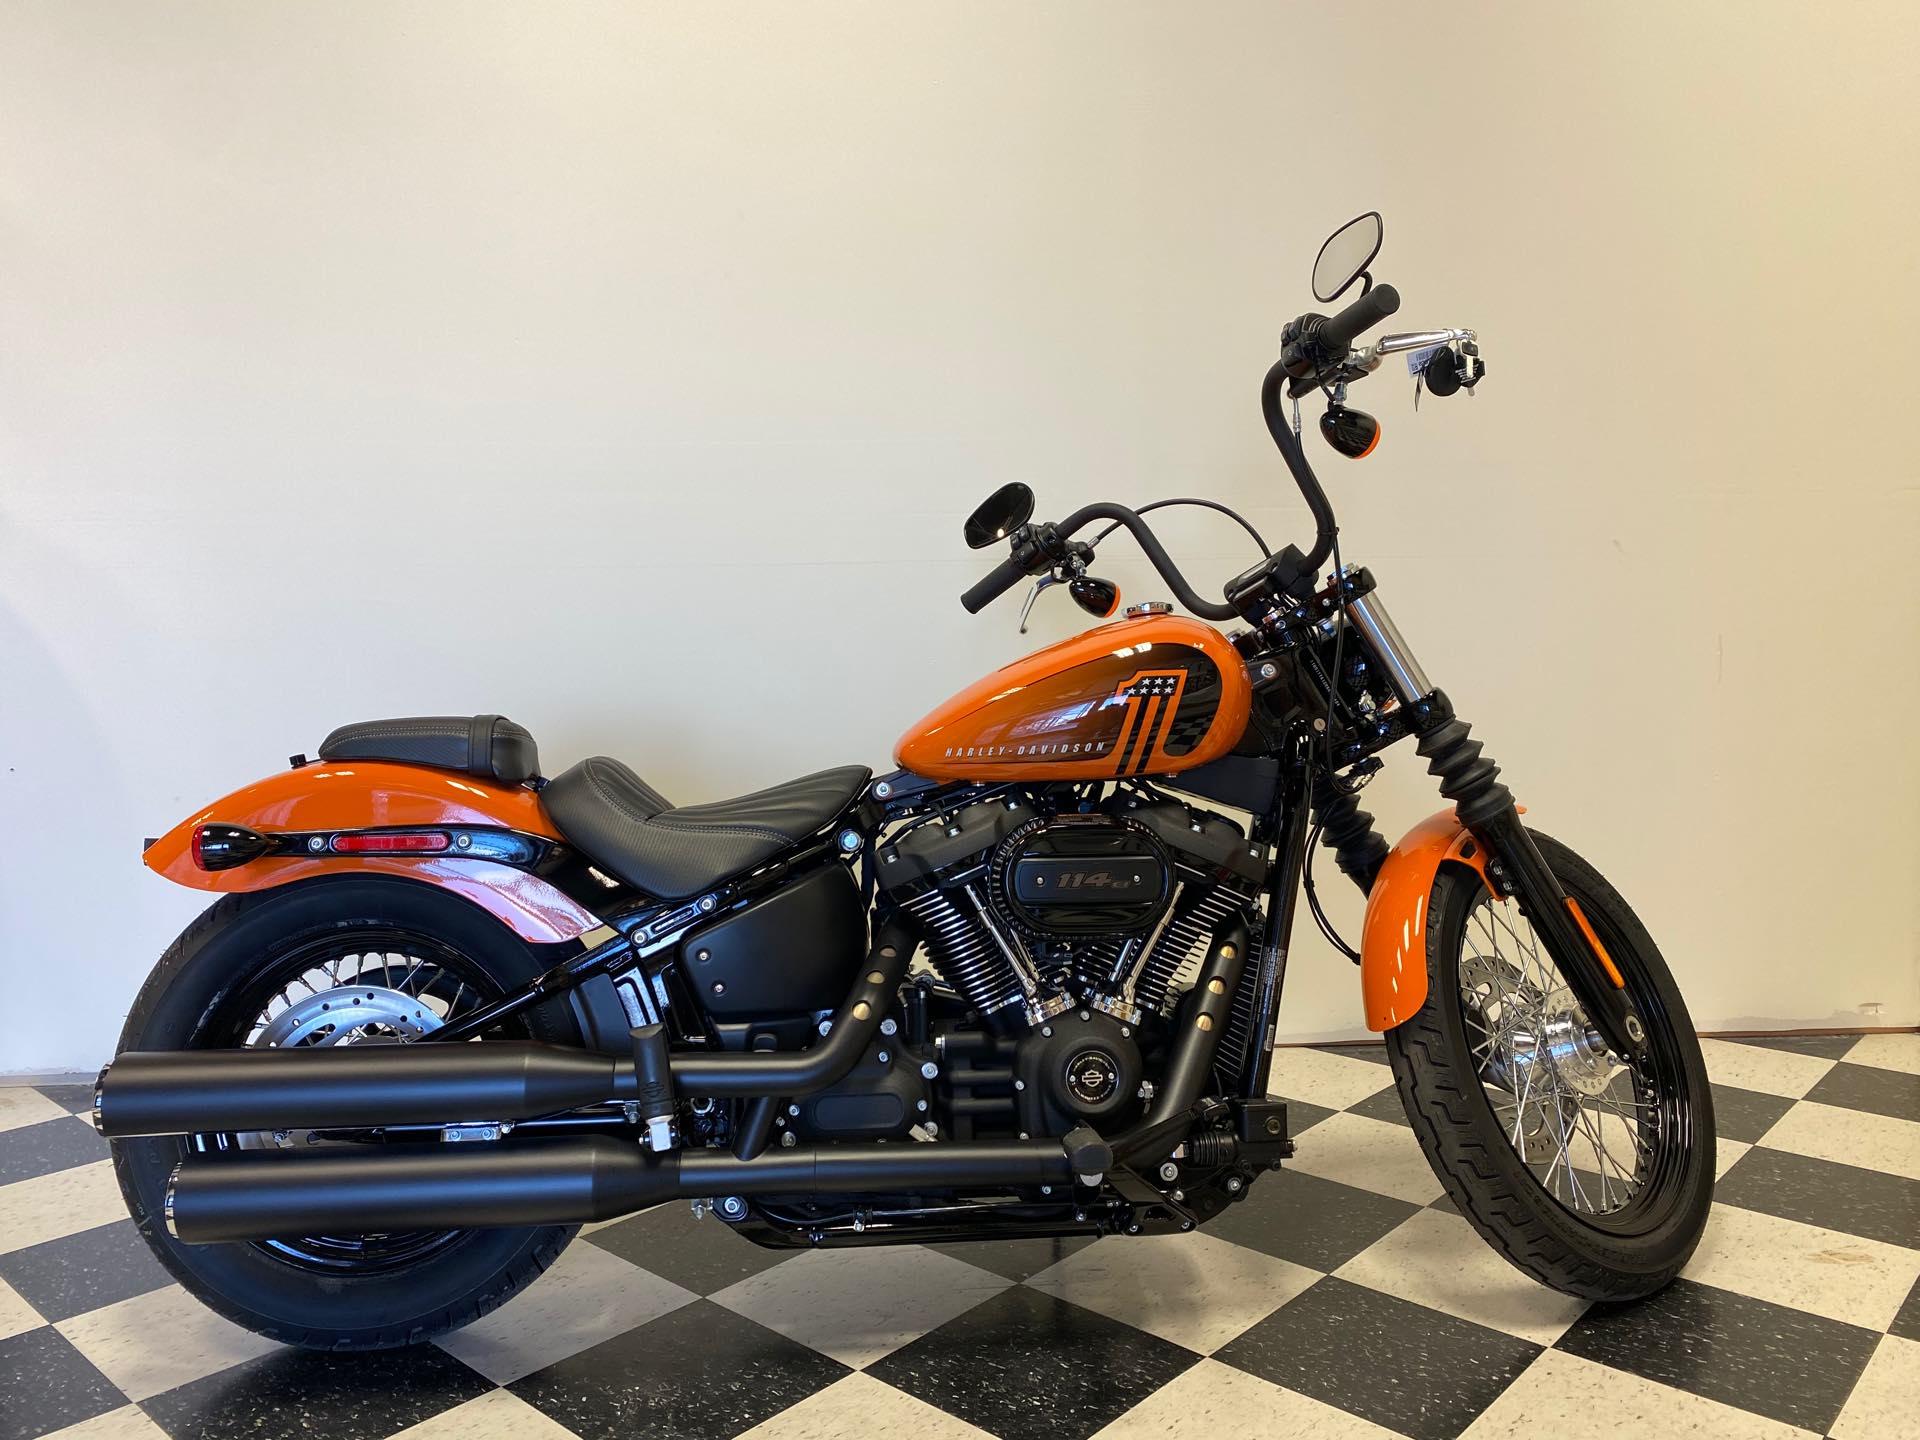 2021 Harley-Davidson Cruiser FXBBS Street Bob 114 at Deluxe Harley Davidson